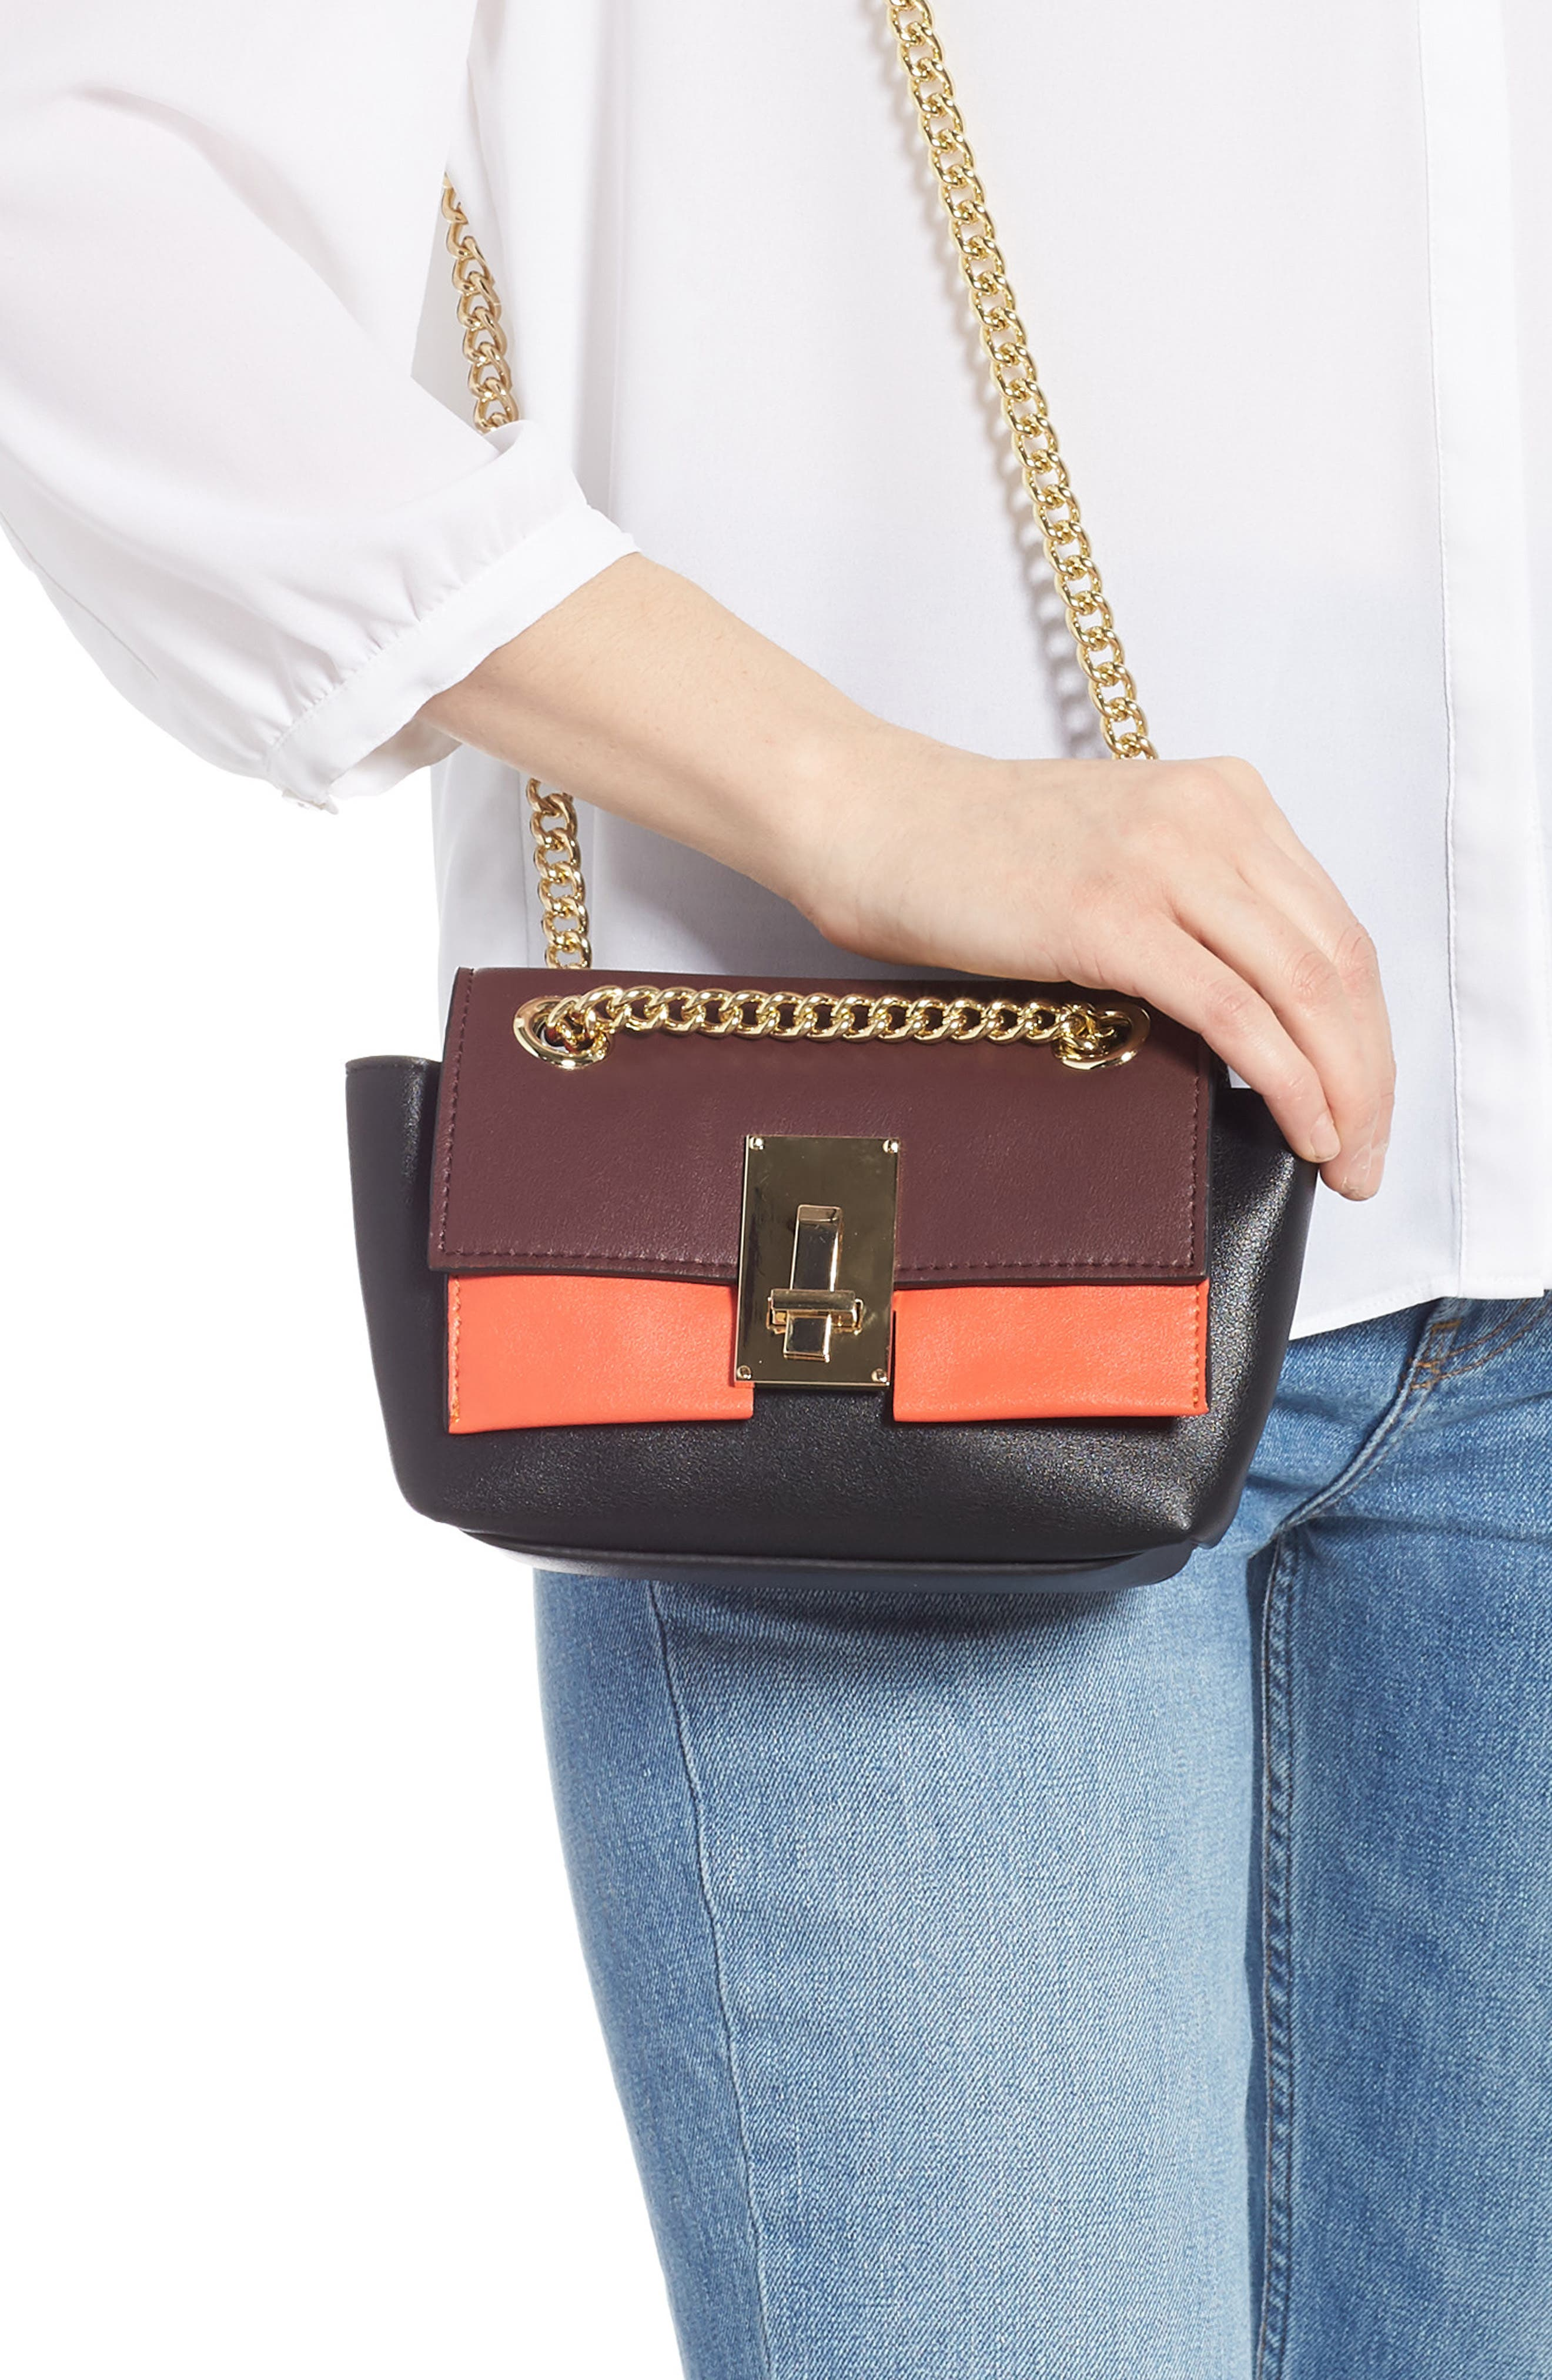 SR Squared by Sondra Roberts Colorblock Handbag,                             Alternate thumbnail 2, color,                             MULTI COMBO